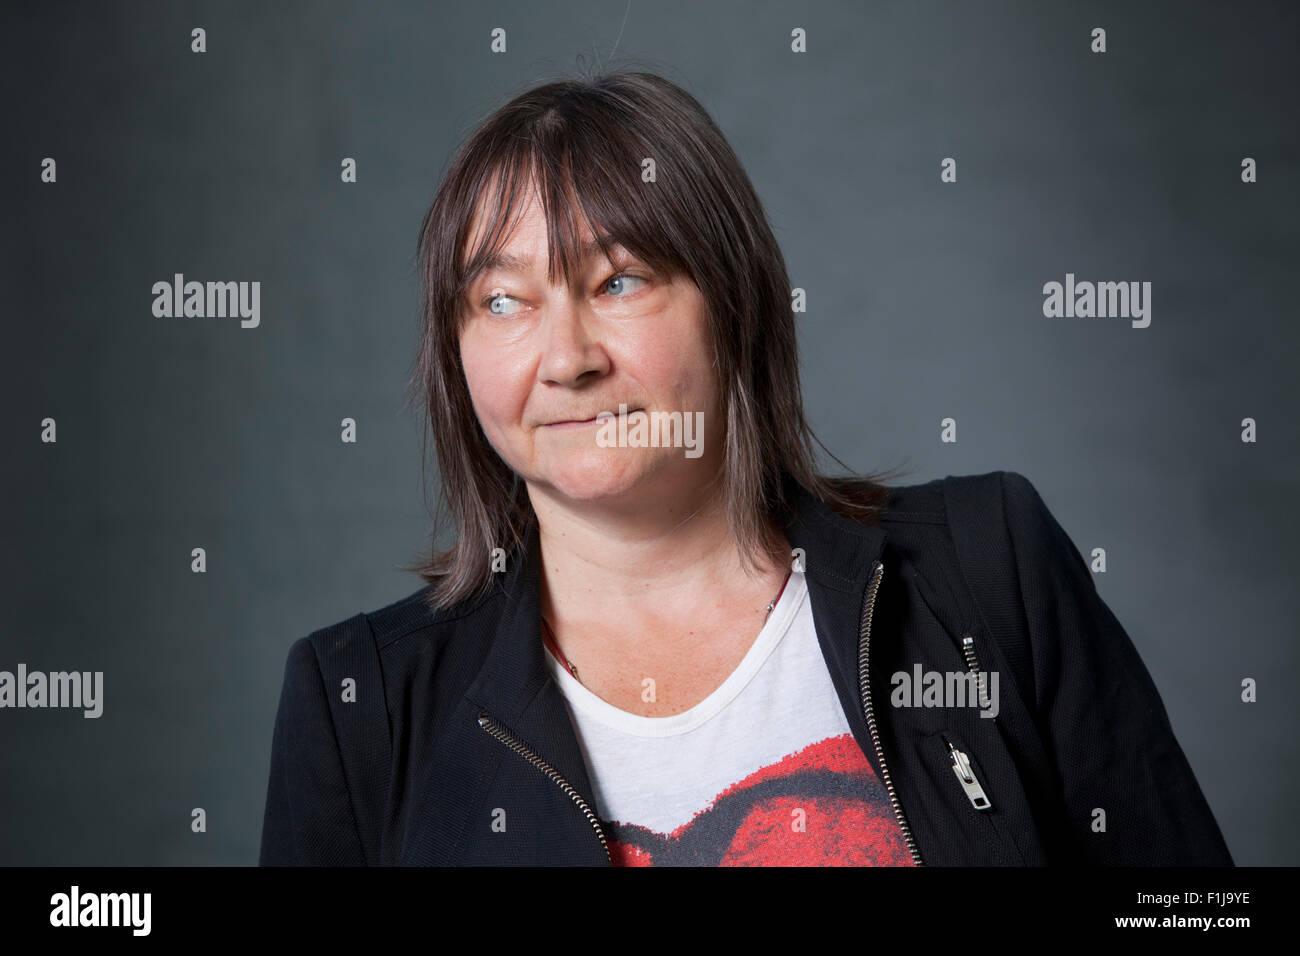 Ali Smith, the Scottish author and novelist at the Edinburgh International Book Festival 2015. Edinburgh, Scotland. - Stock Image